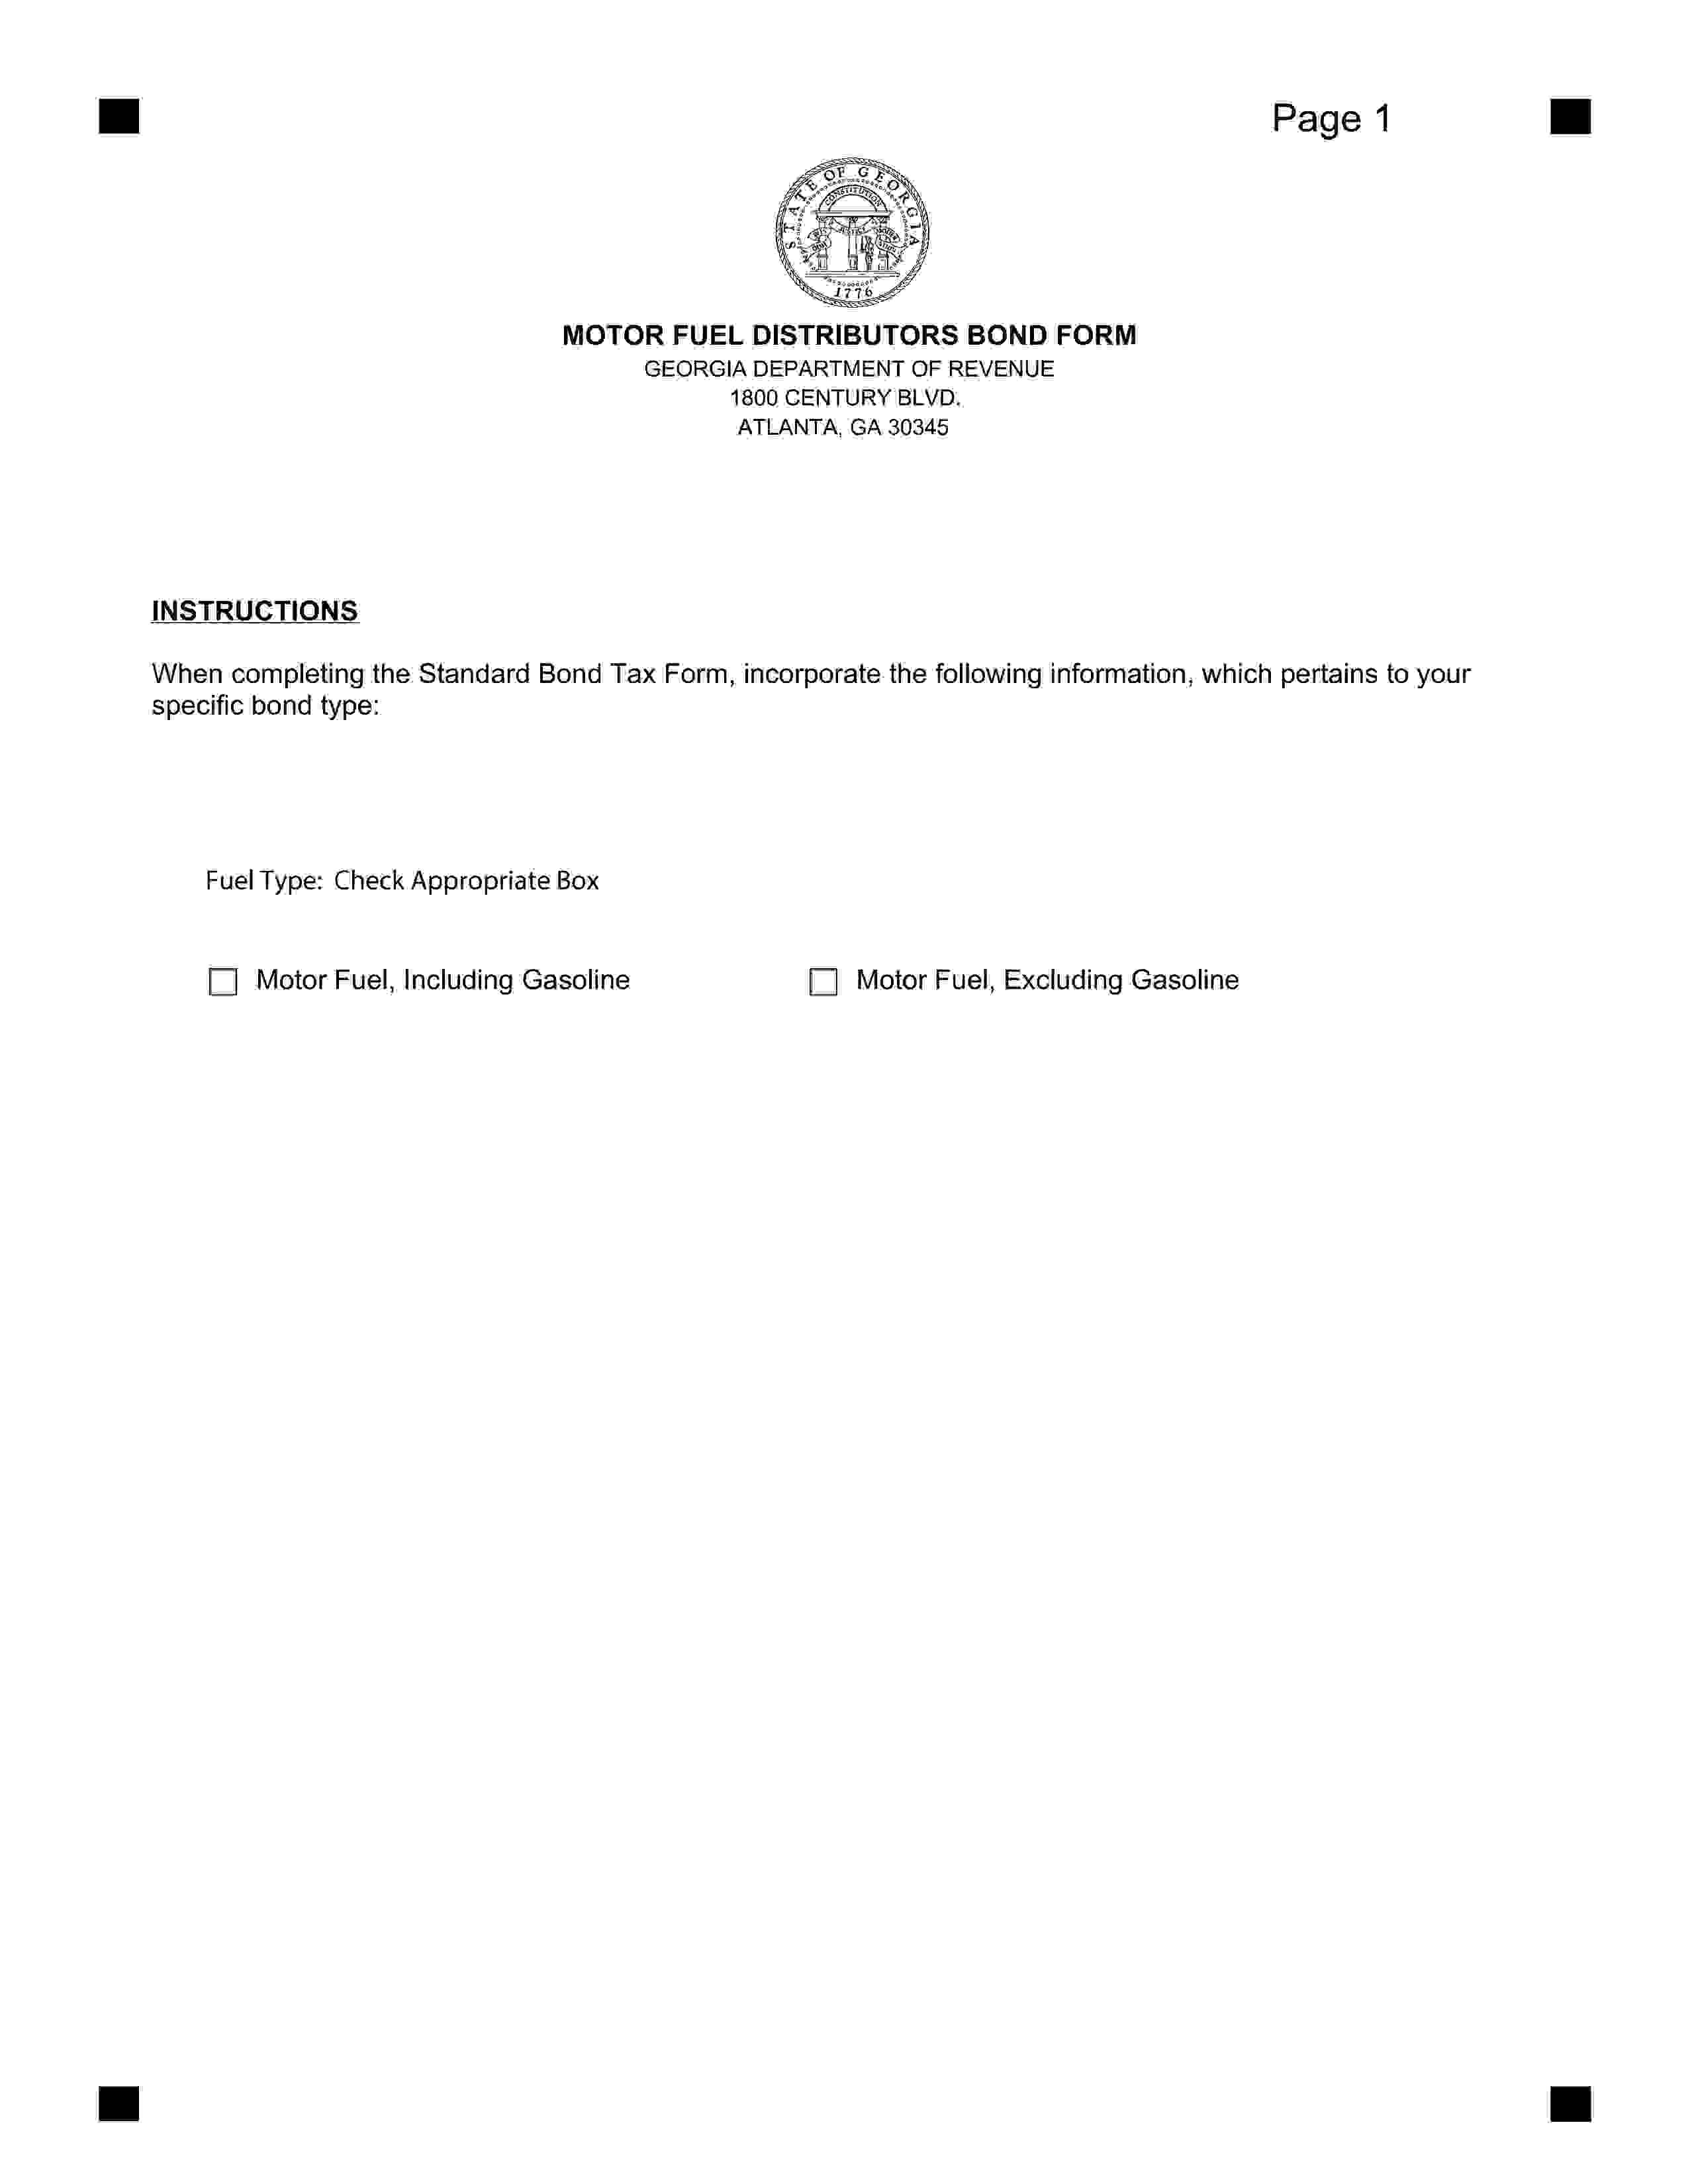 Georgia Department of Revenue Motor Fuel Distributor Bond sample image